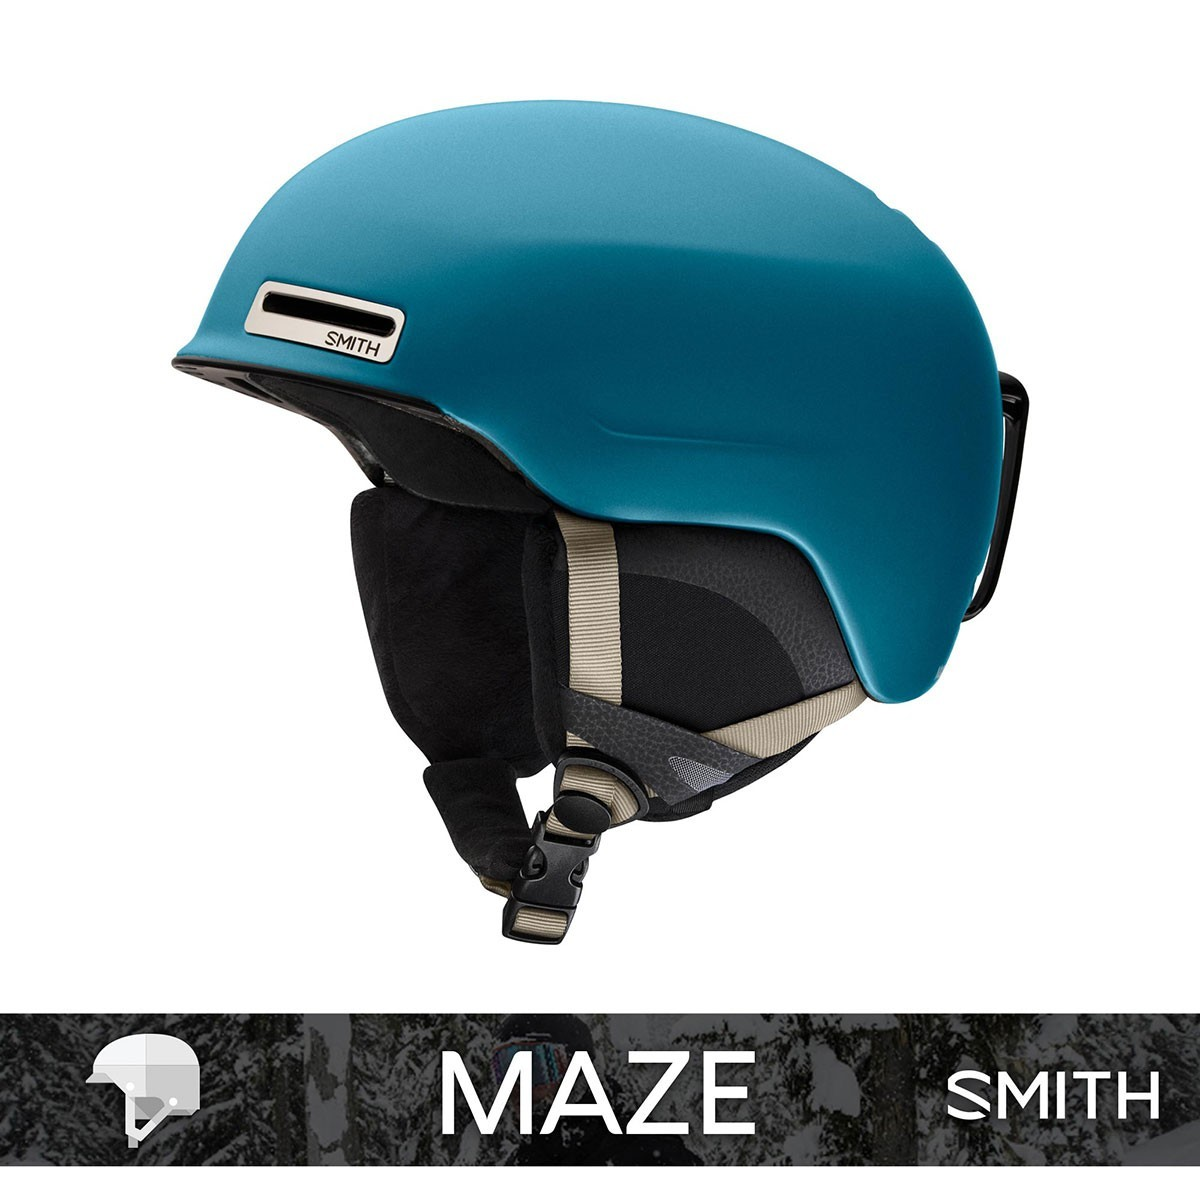 SMITH MAZE matte Thypoon - Изображение - AQUAMATRIX